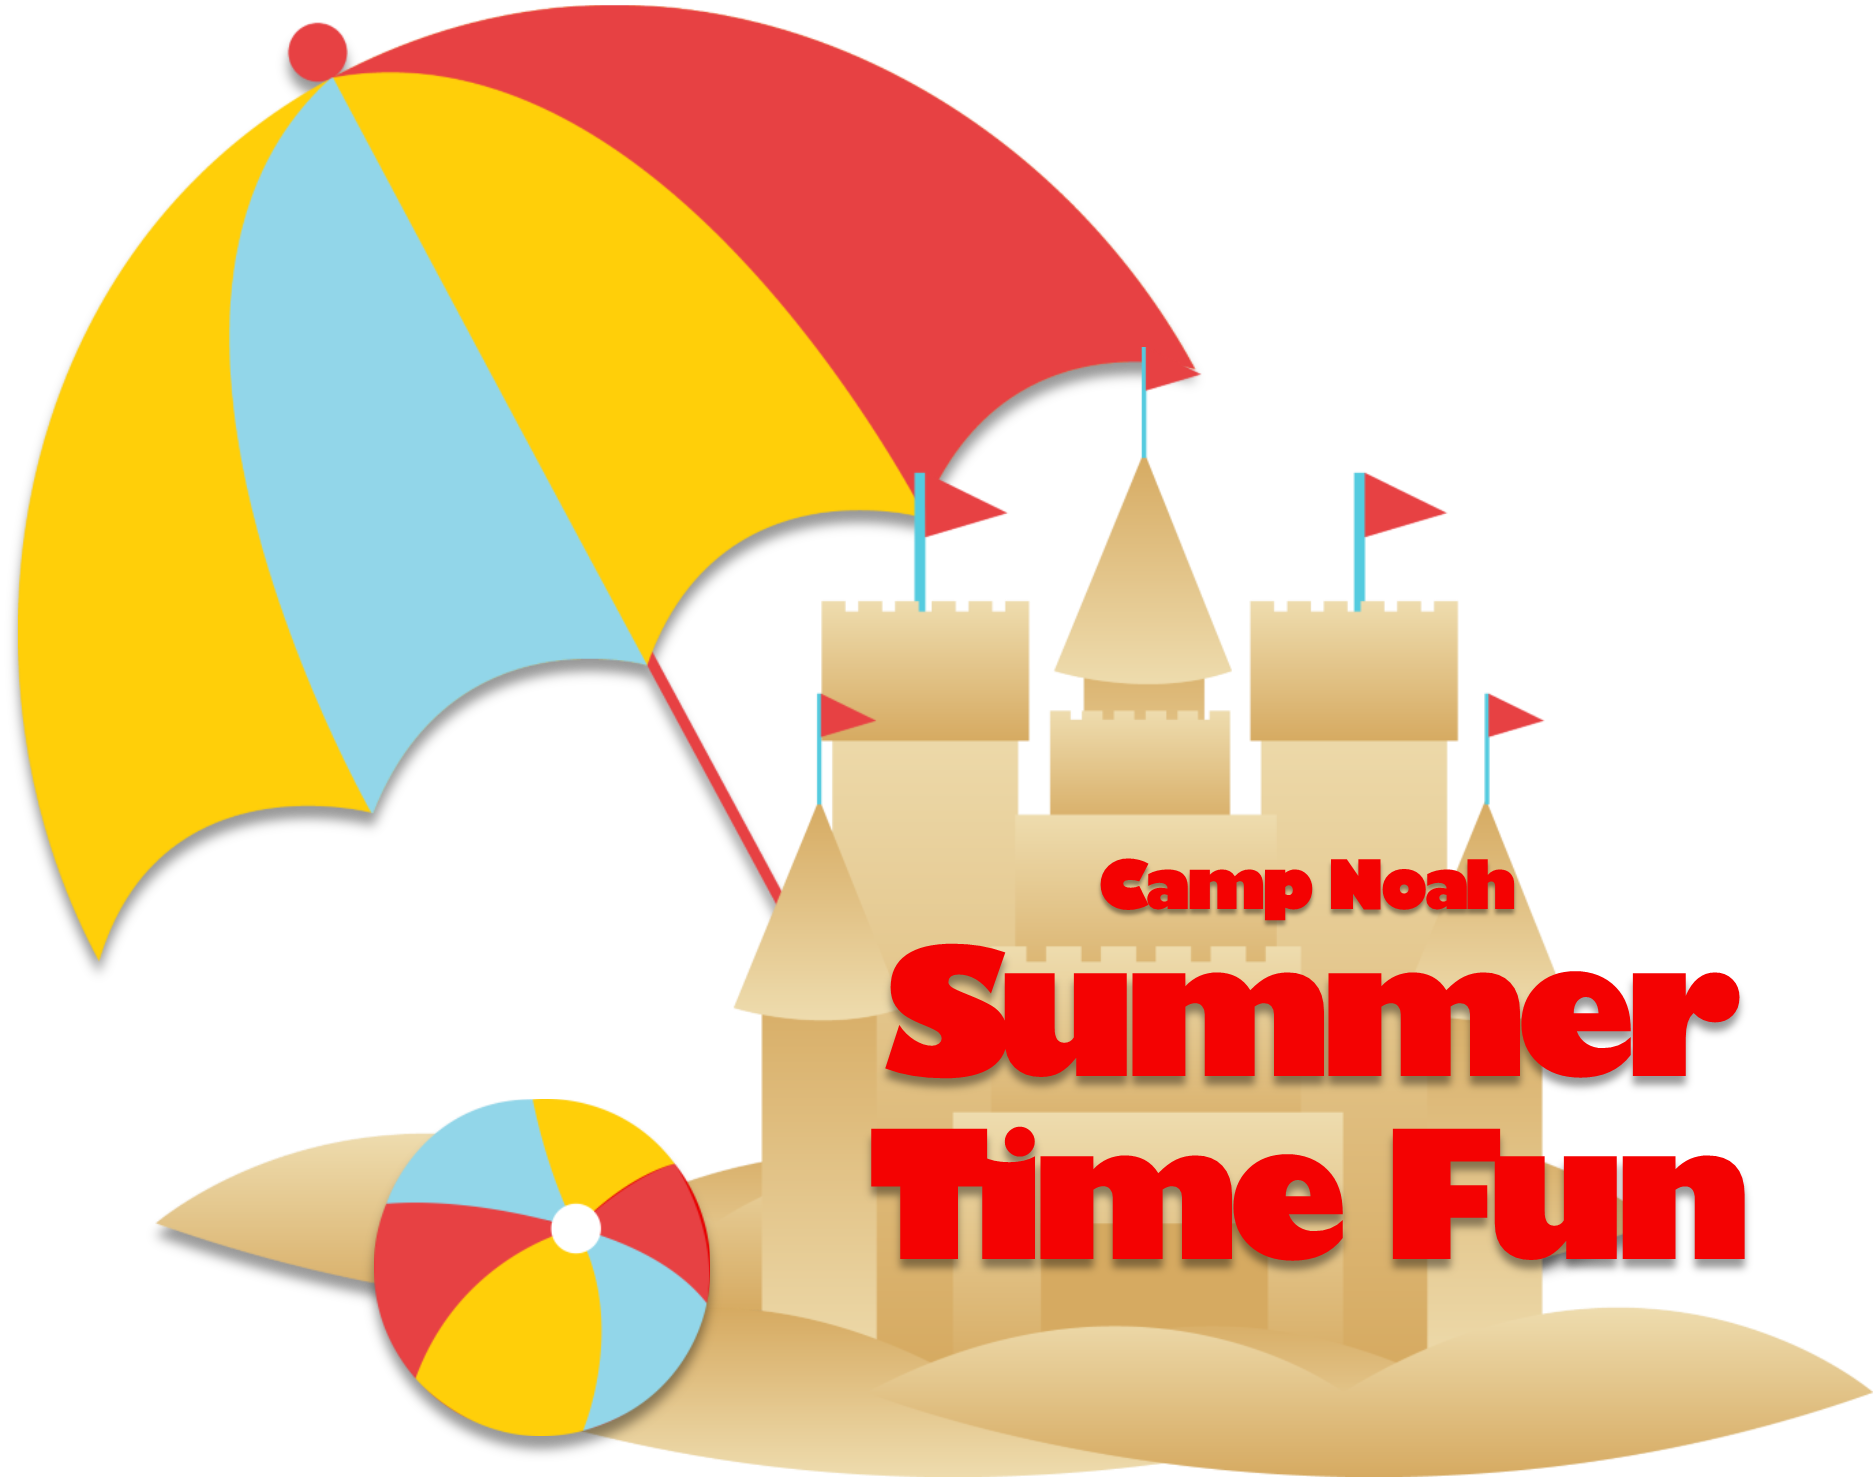 Summer time fun logo